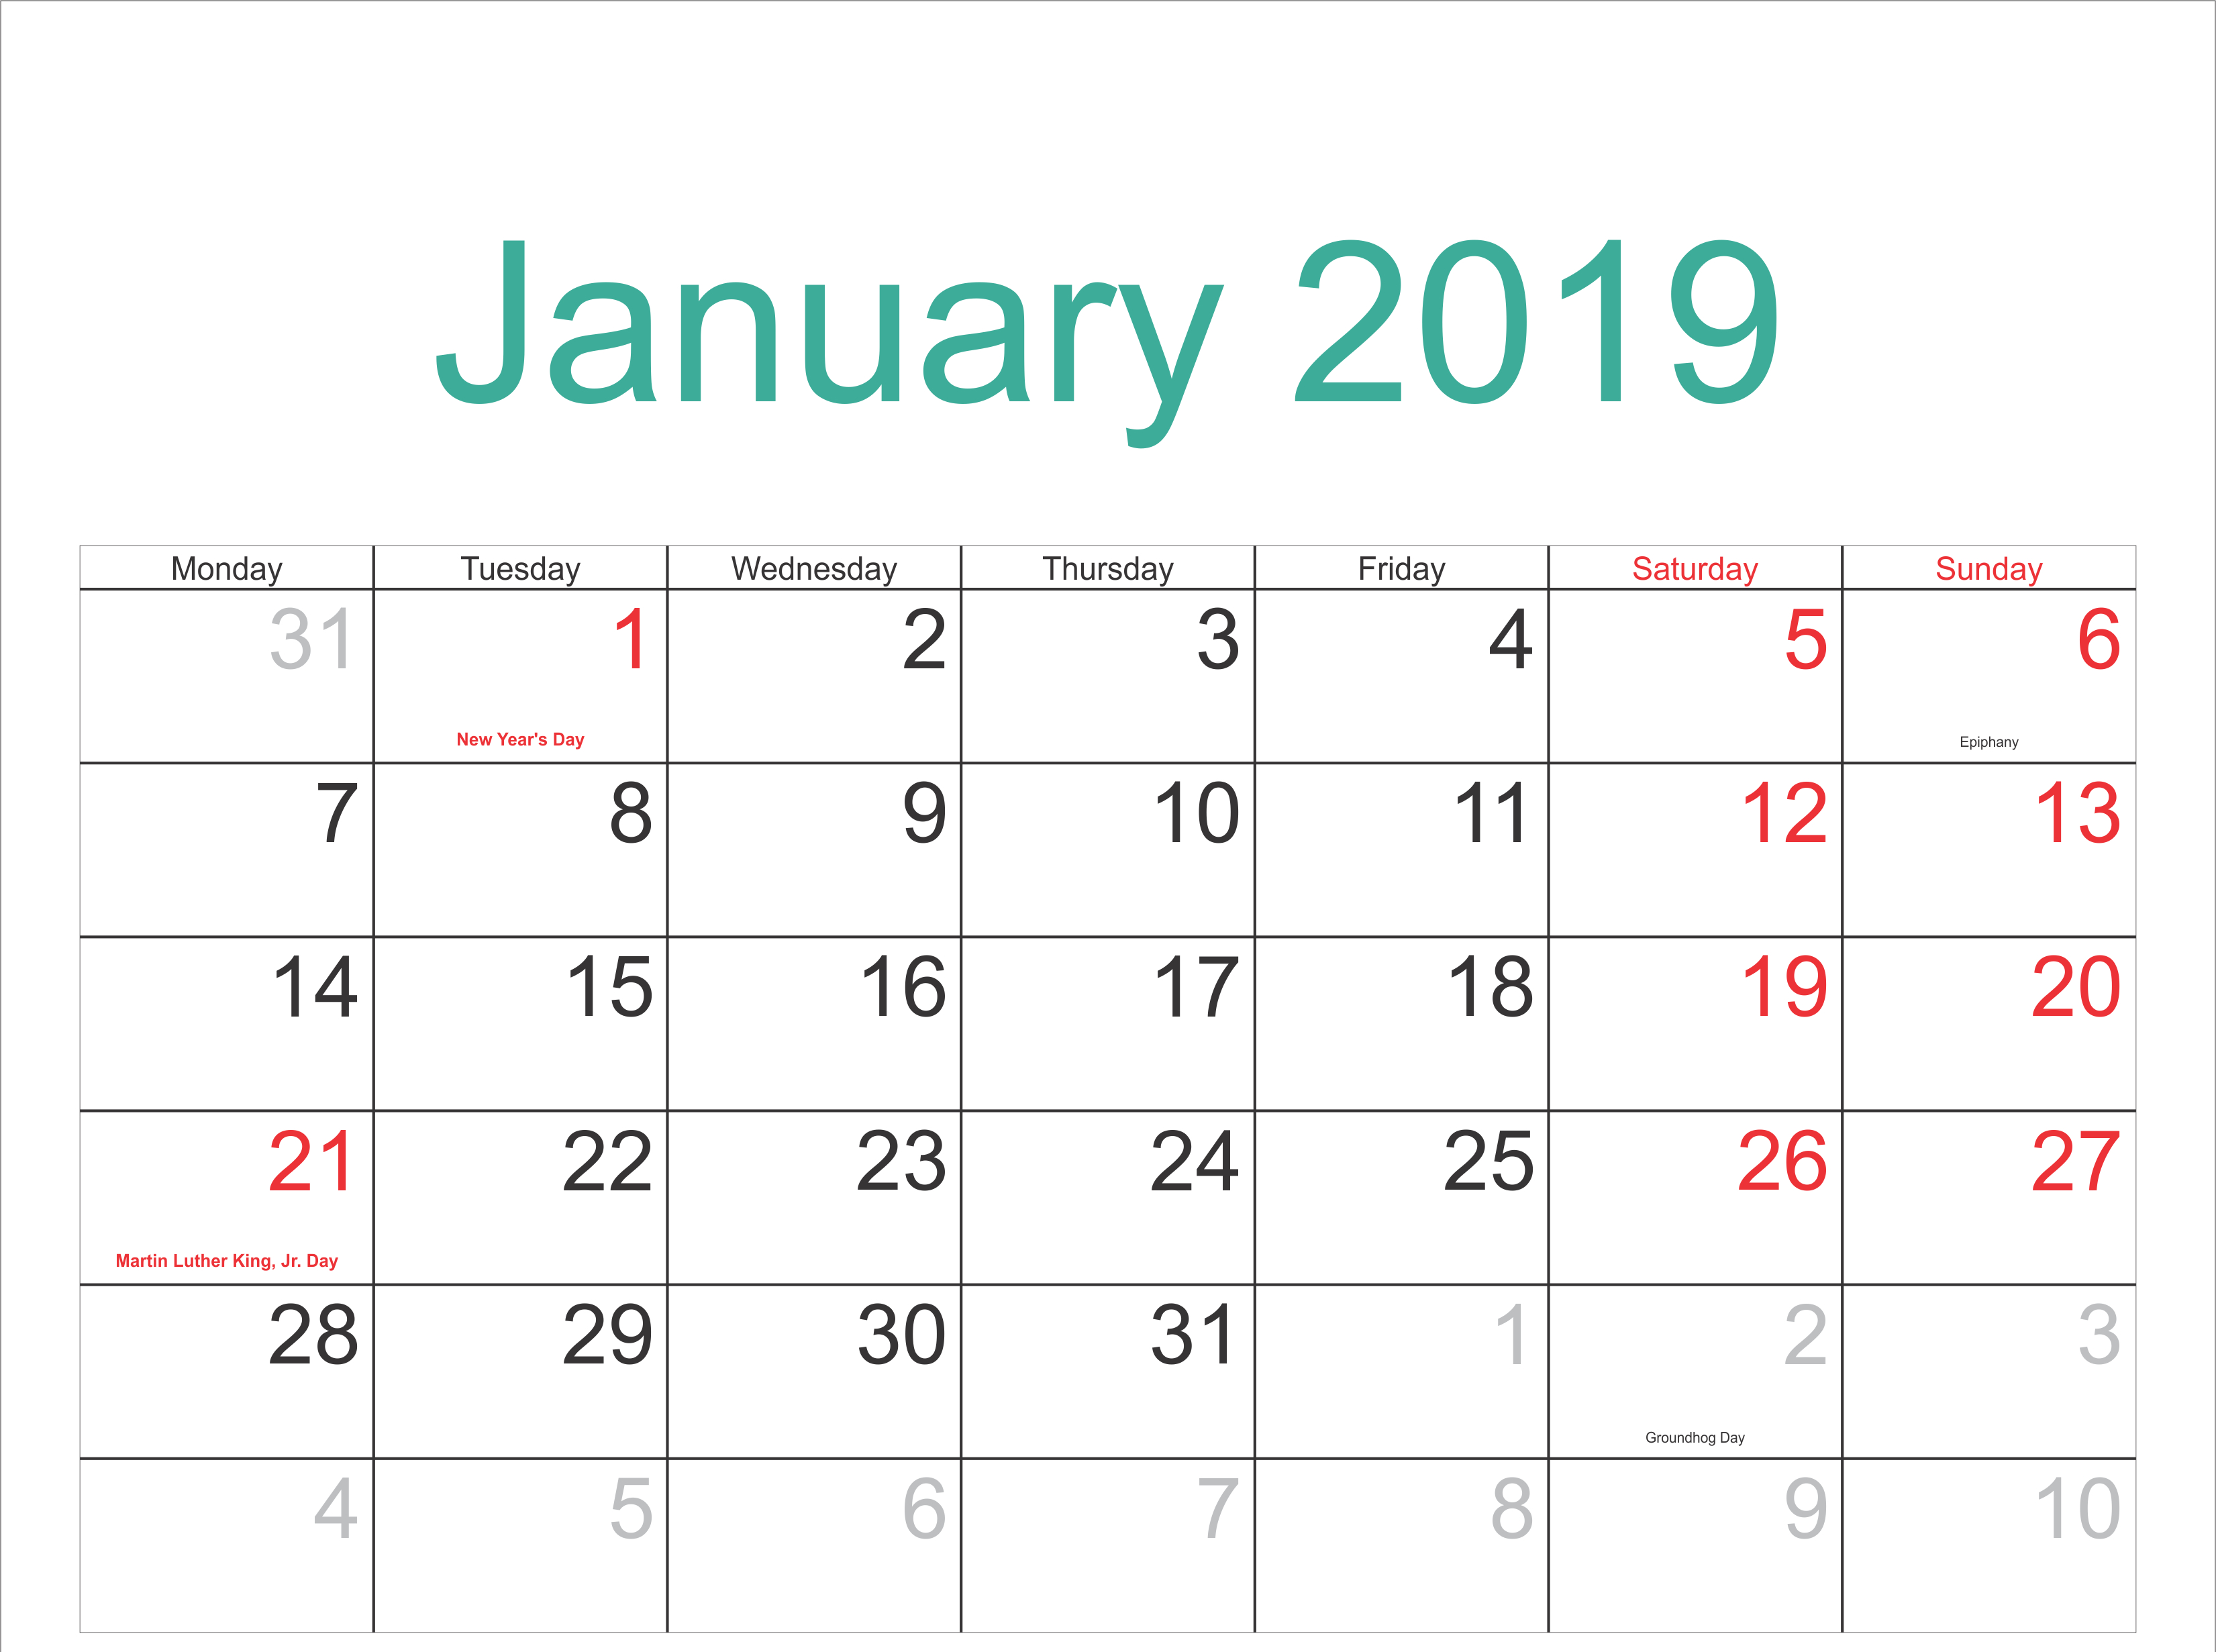 January 2019 Calendar Archives – 2019 Calendar Template Holidays 6 Nations 2019 Calendar Download